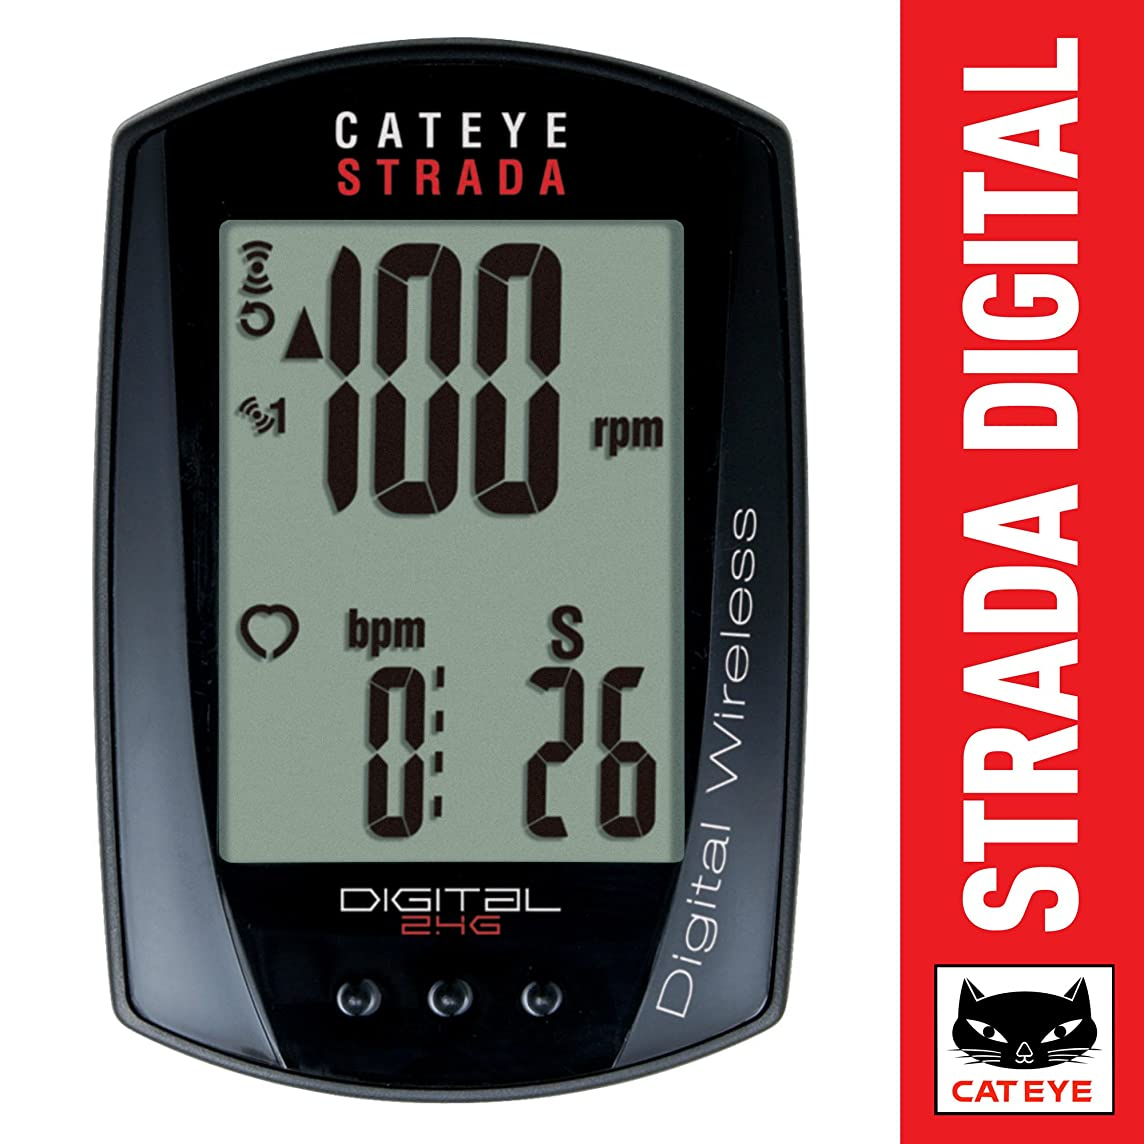 CatEye Strada Digital Wireless Bicycle Computer w/Speed/Cadence/Heart Rate - CC-RD430DW